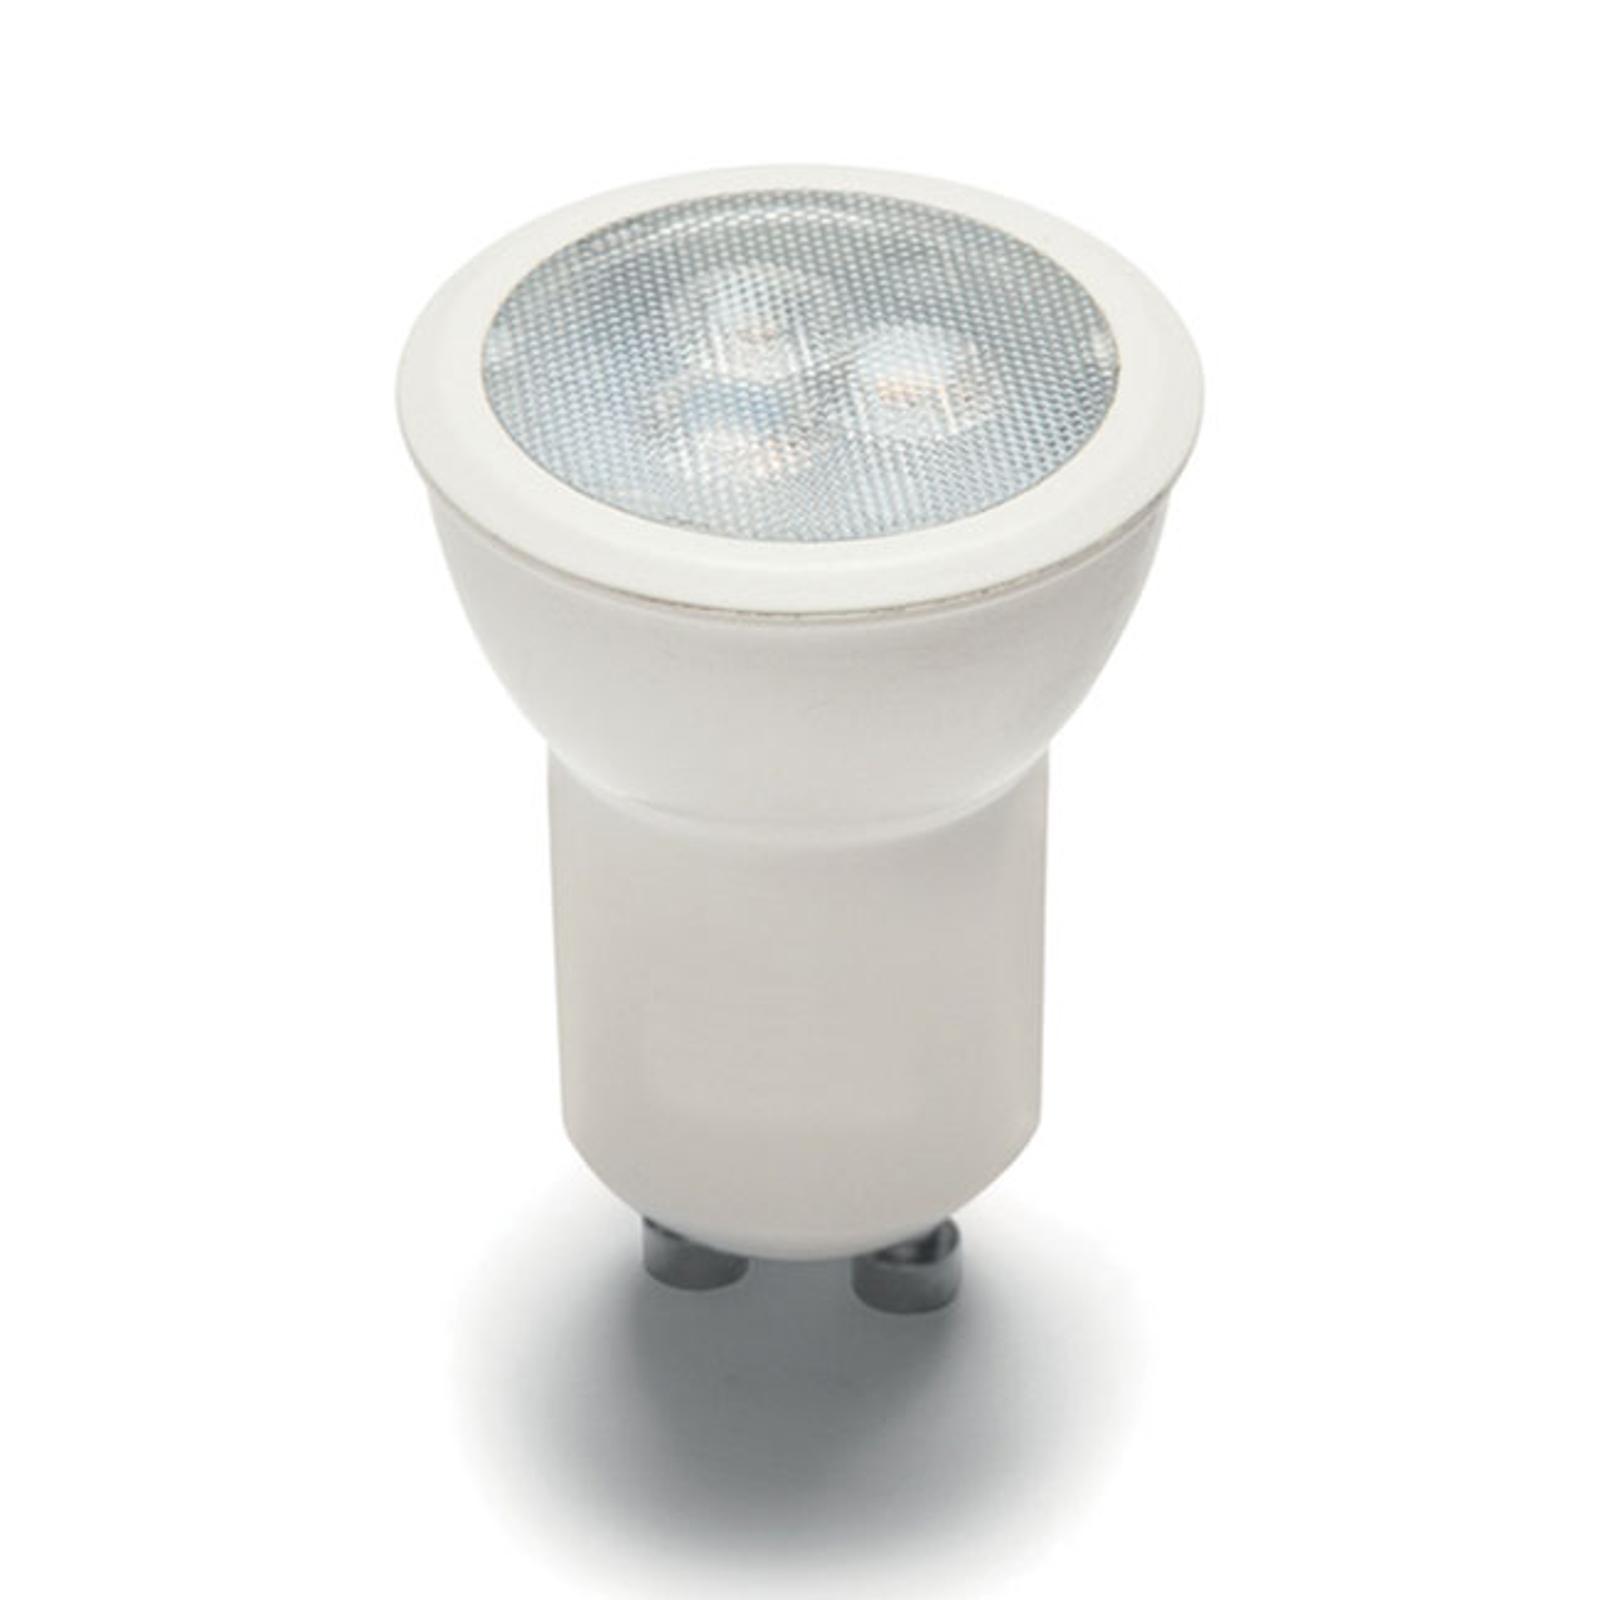 GU10 LED-Lampe 3,2W Ø3,5cm 220lm 3.000K